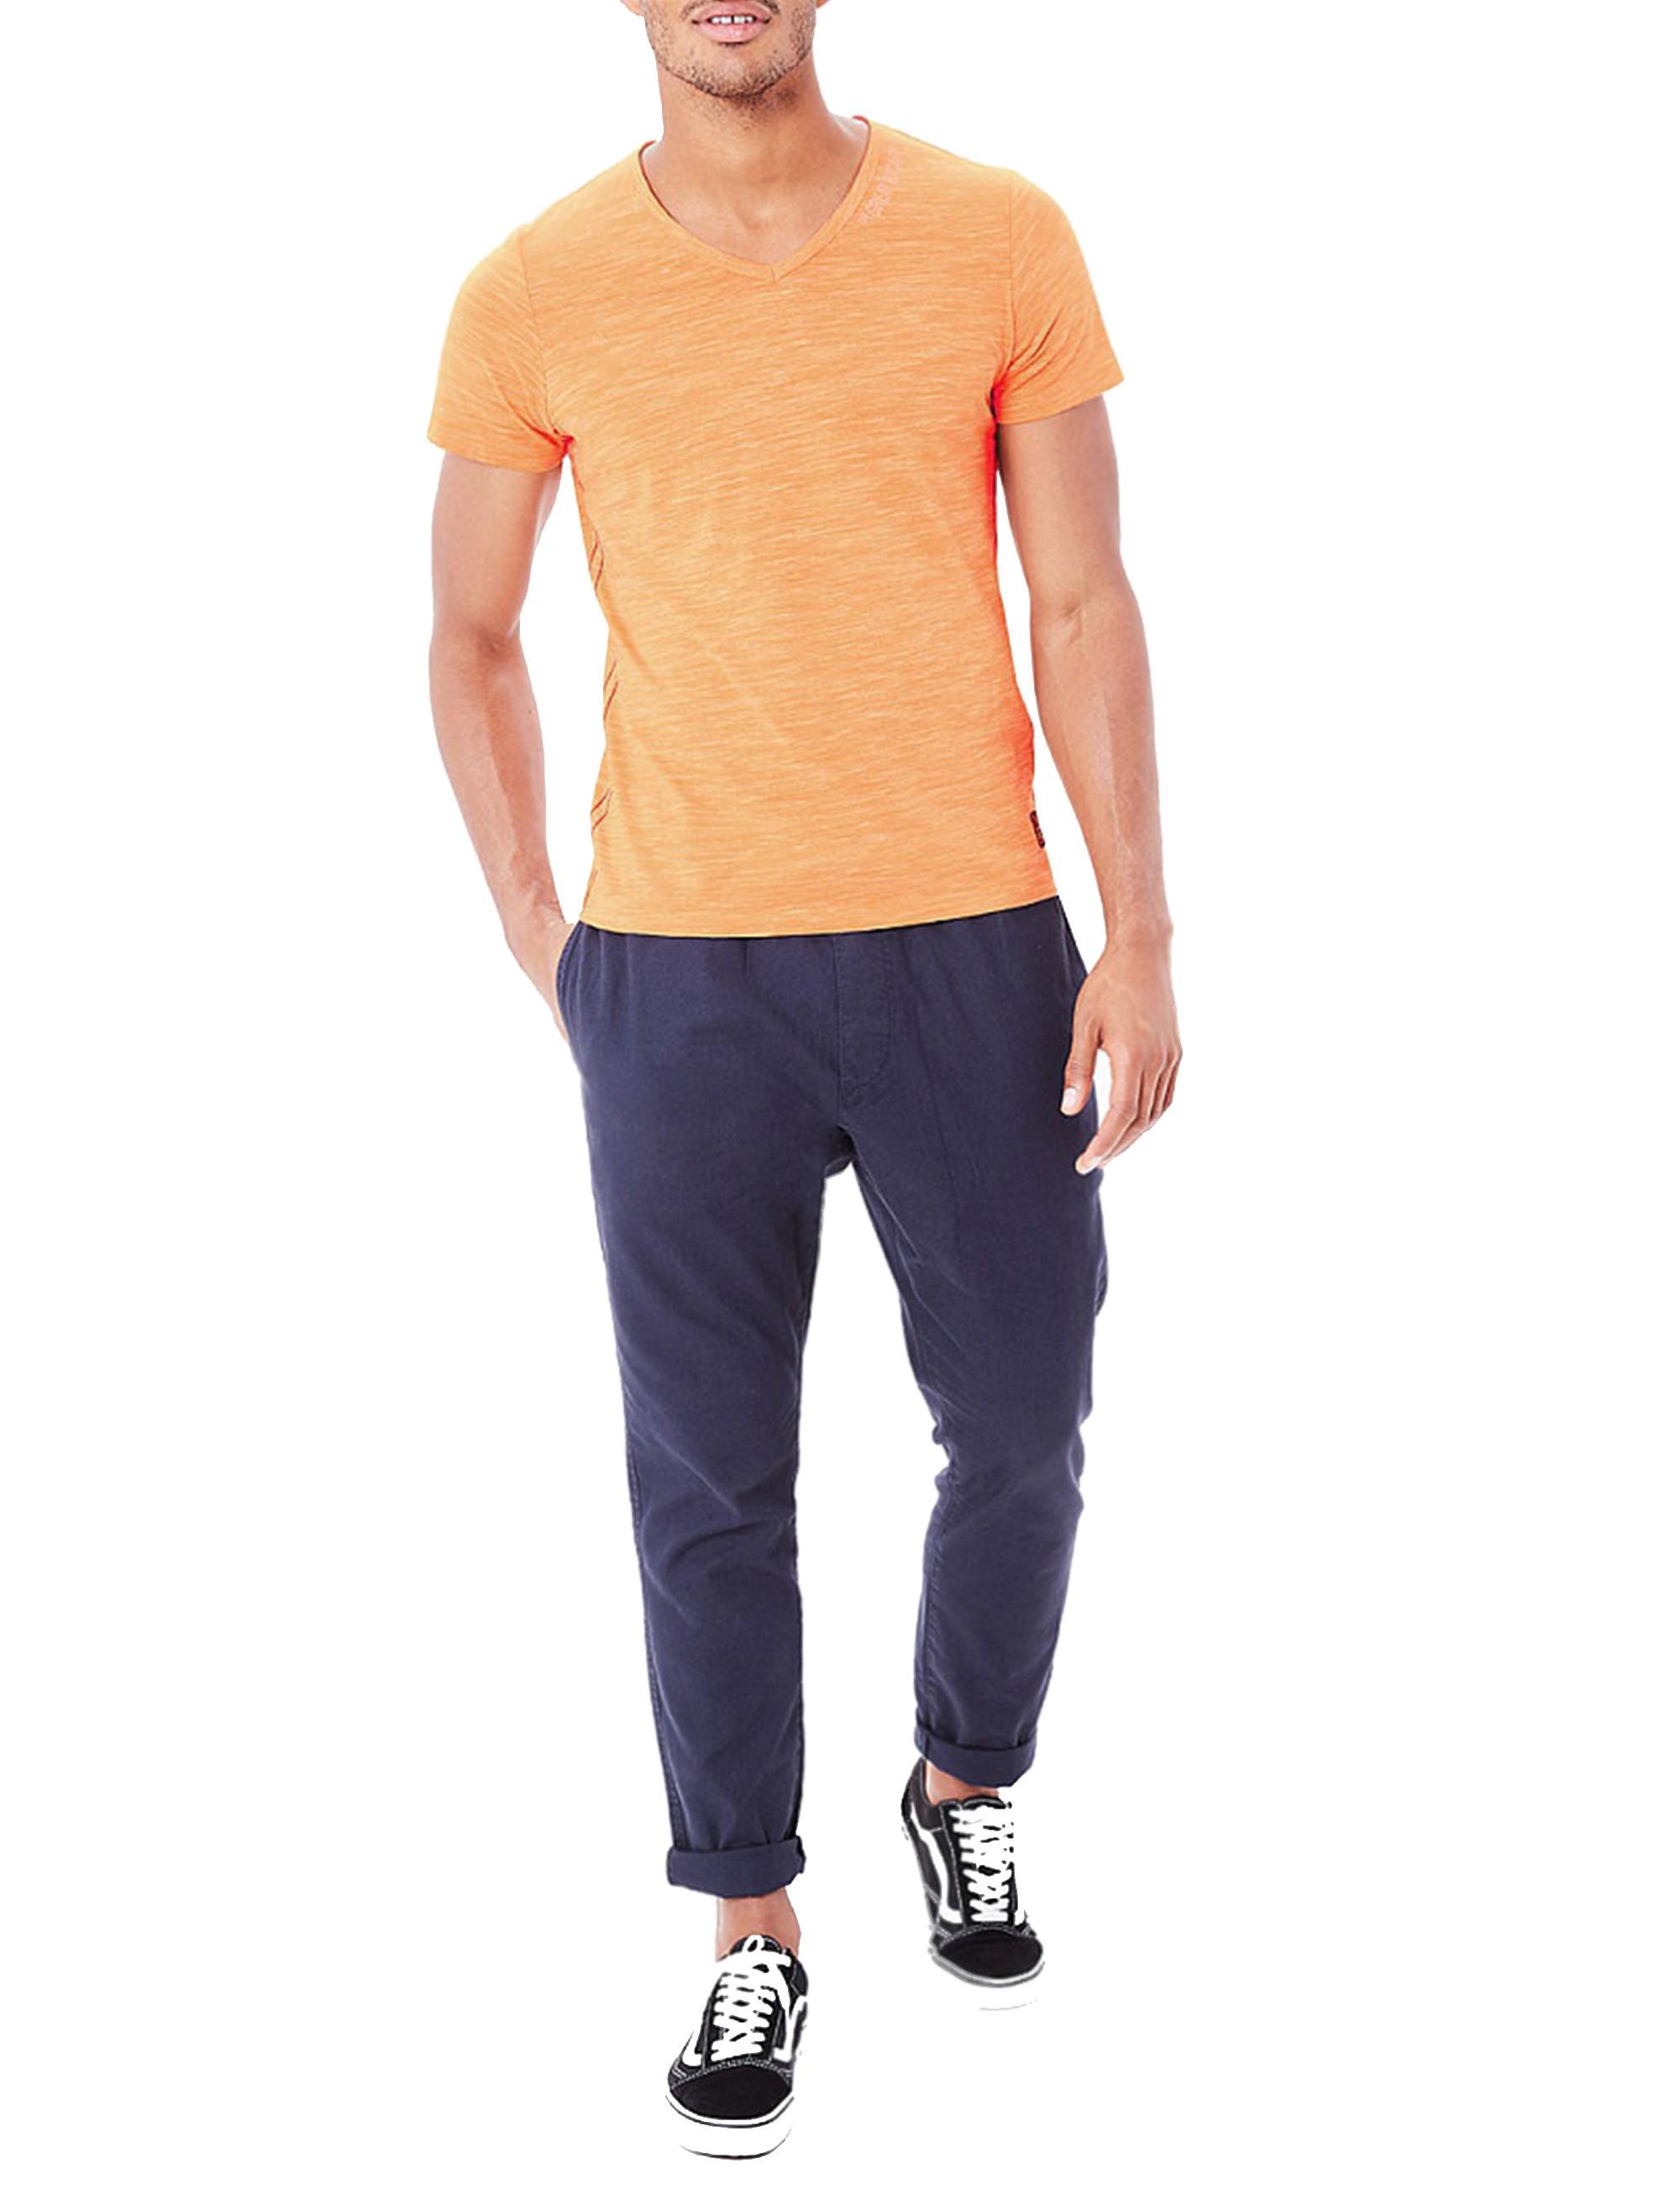 تی شرت نخی یقه هفت مردانه - اس.اولیور - نارنجي روشن - 1